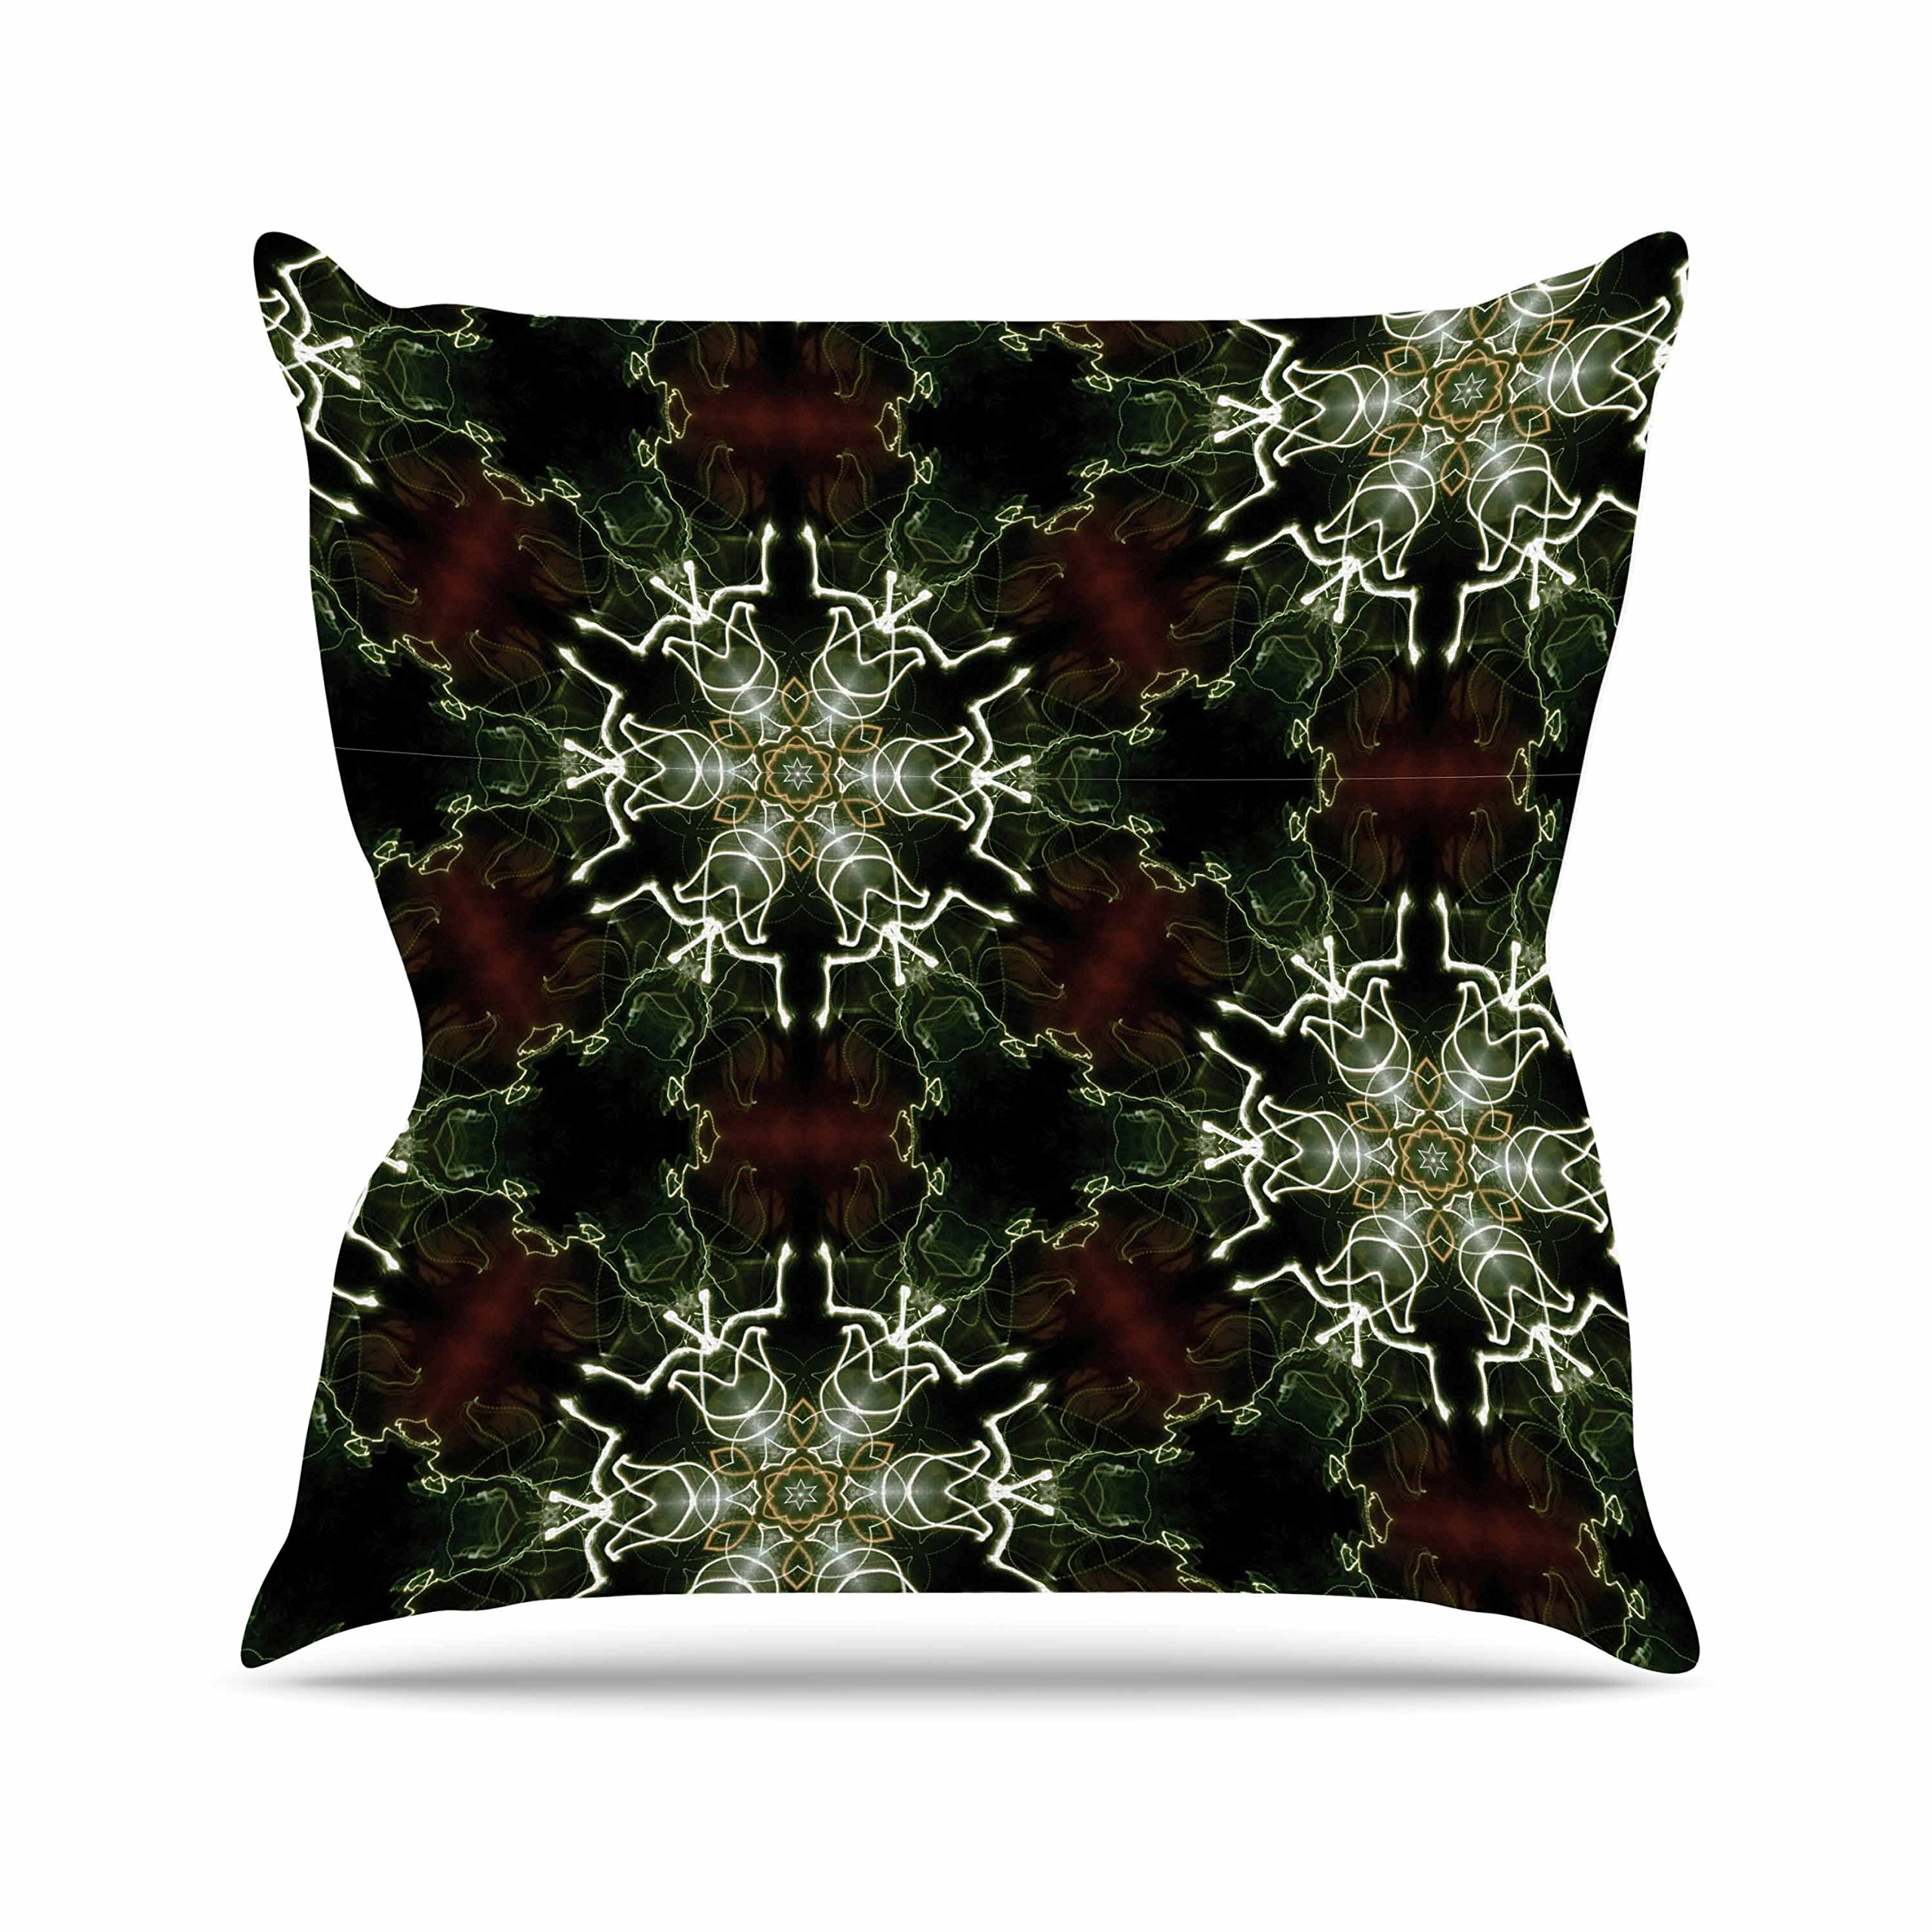 Kess InHouse Gukuuki Mandala Lights Black Abstract Outdoor Throw Pillow, 16'' x 16''